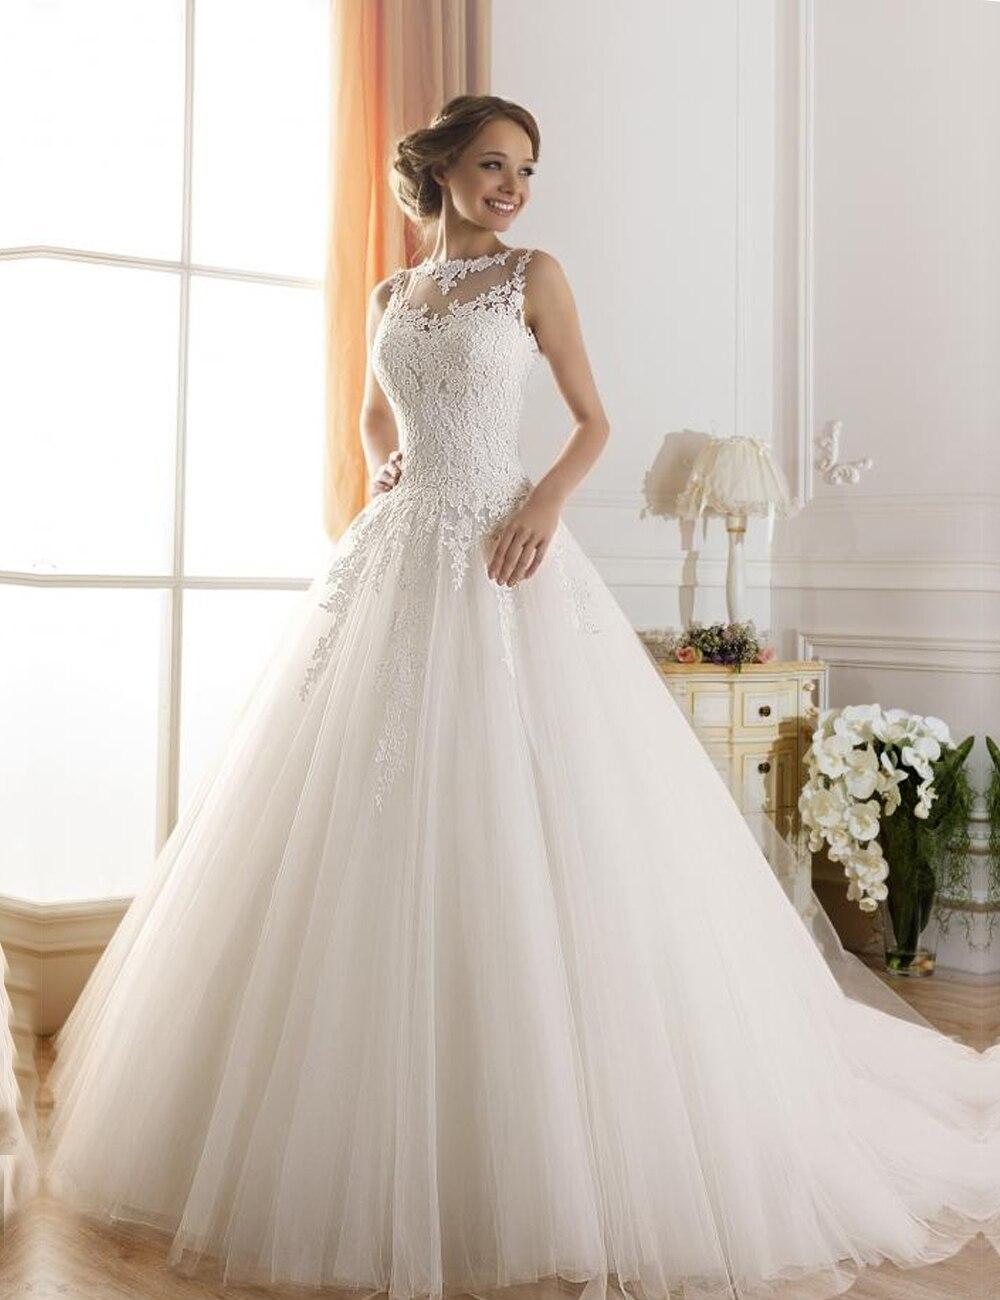 2015 A Line Lace Wedding Dresses SexyJewel Sheer Neckline Beaded Lace Fluffy Robes De Mariage Vestido De Novia Sin Espalda